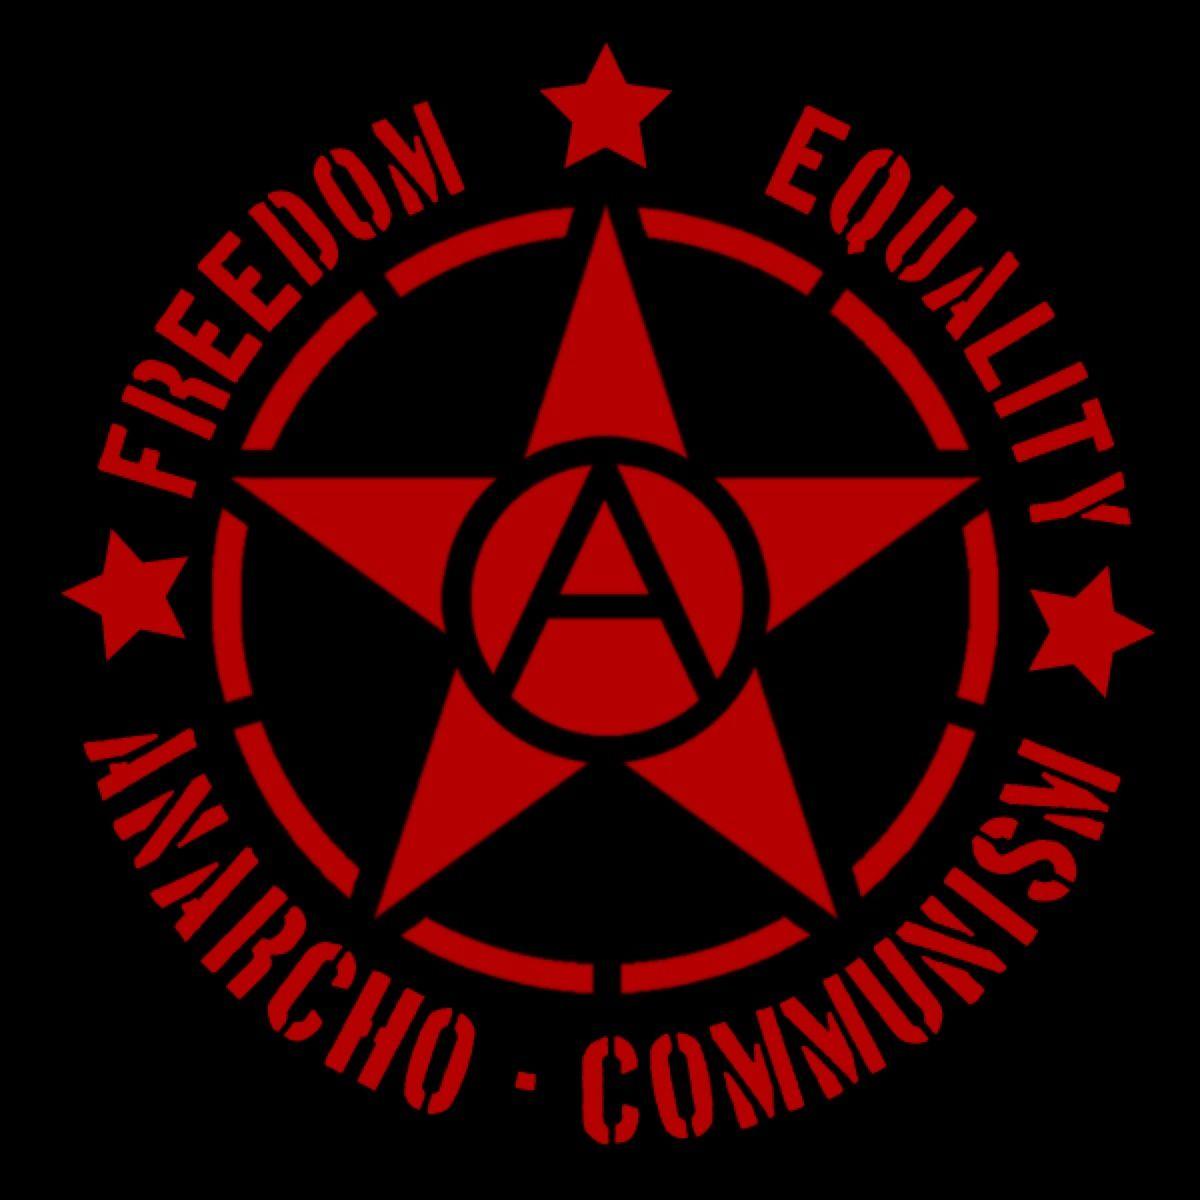 Communist symbols tumblr anarcho communism pinterest communist symbols tumblr biocorpaavc